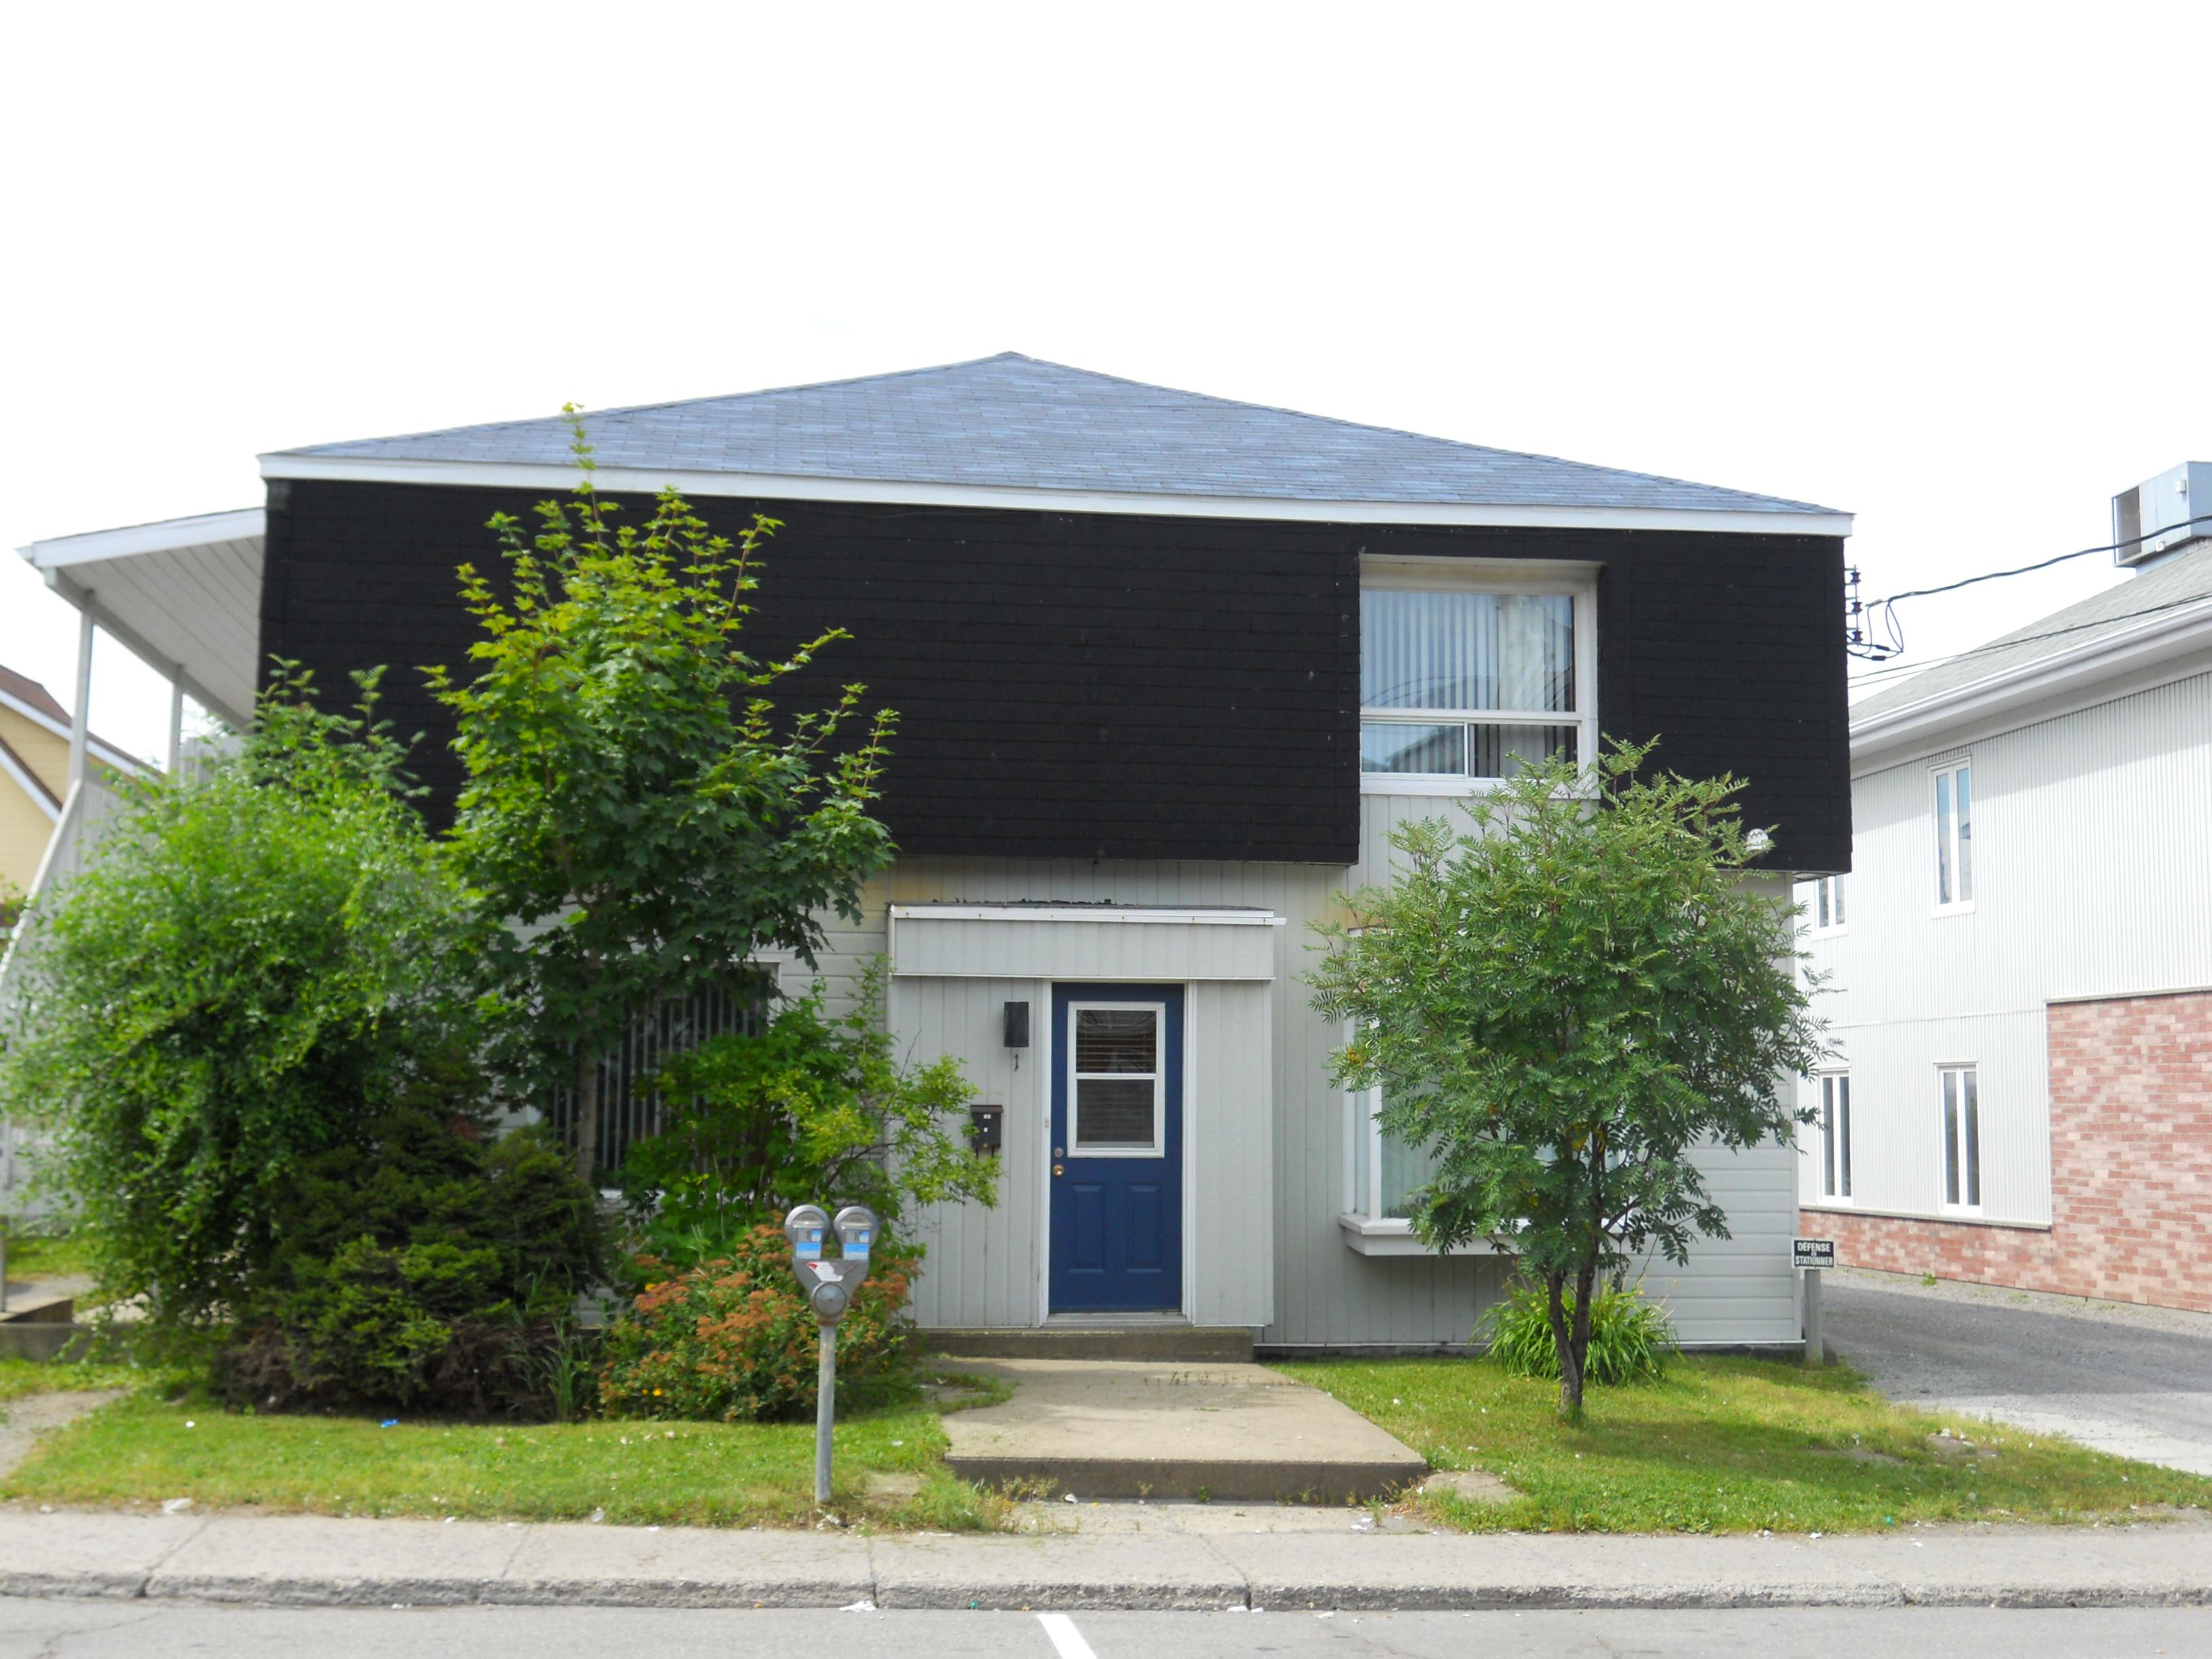 1235 - 99-101, avenue Rouleau